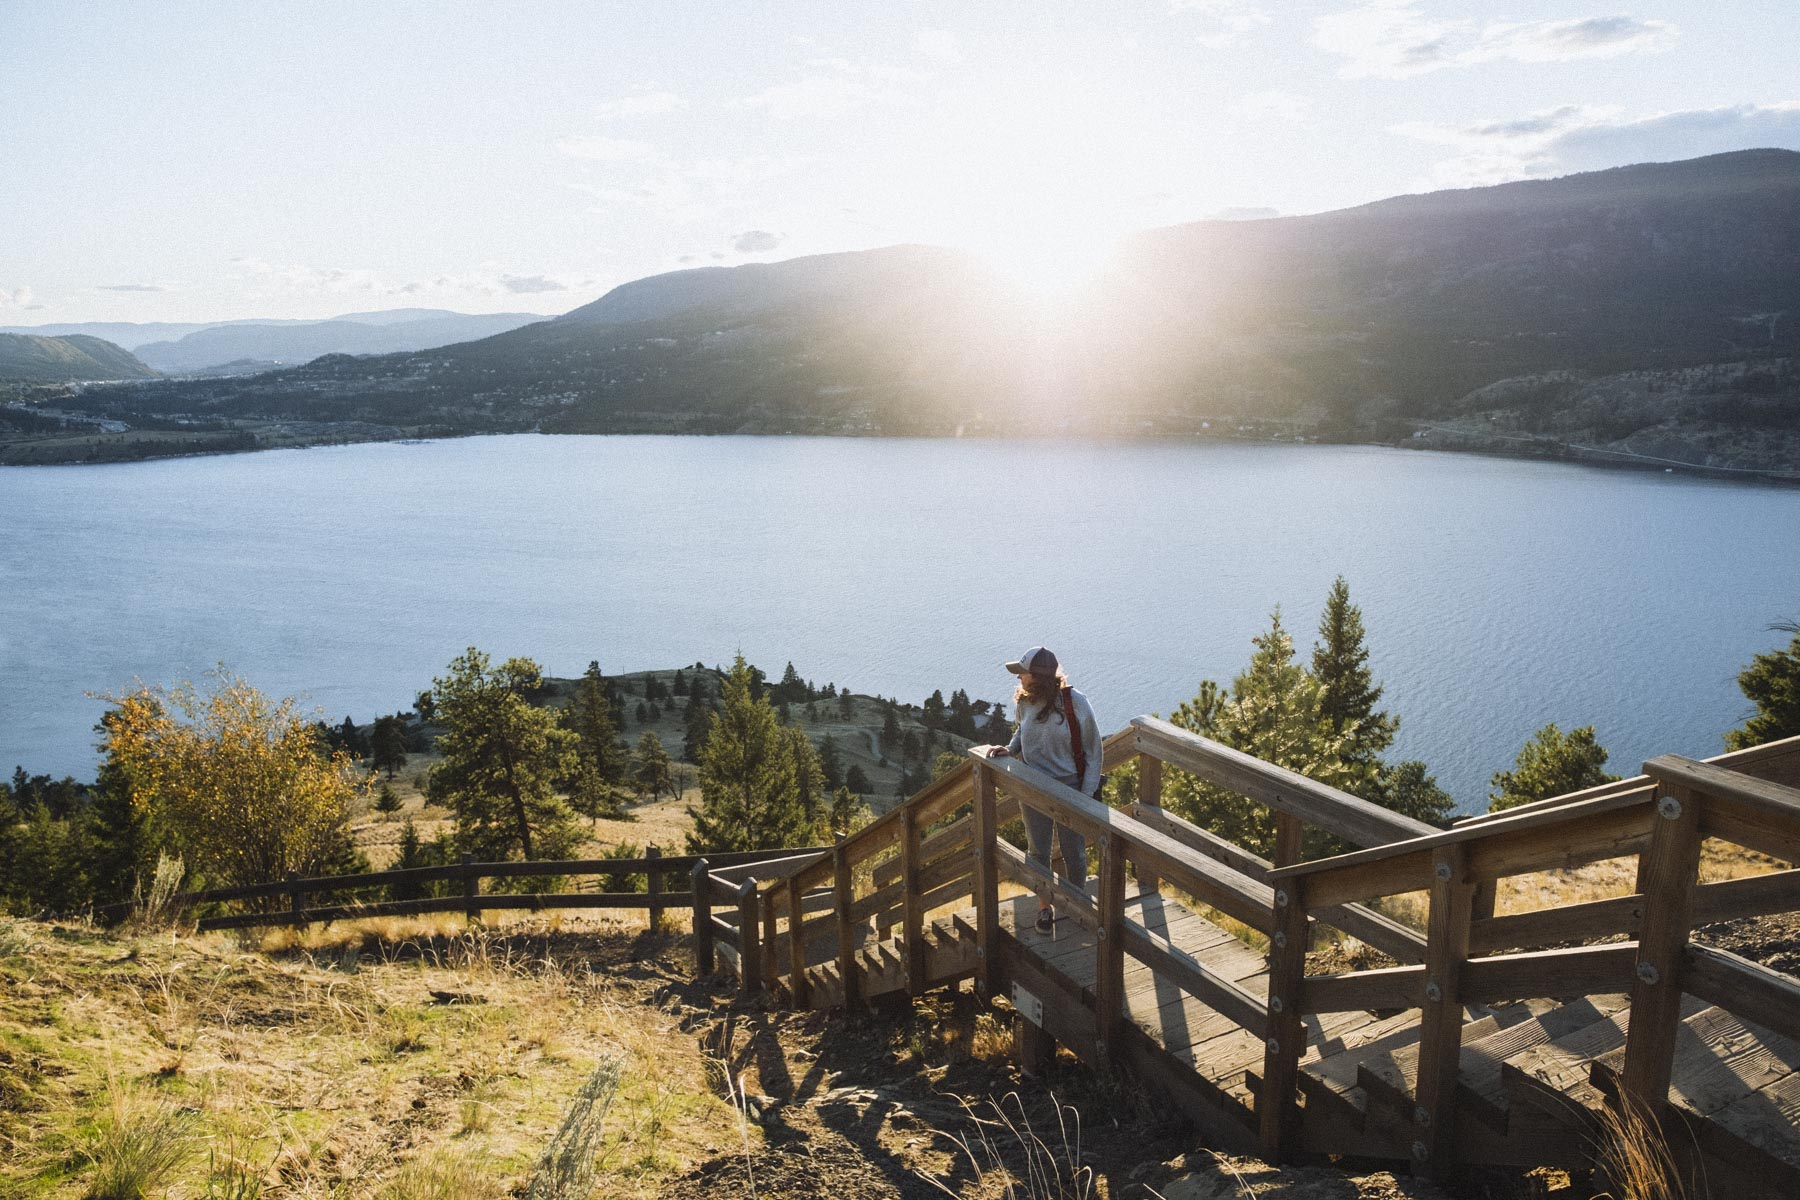 View of Okanagan Lake from Knox Mountain, Kelowna Photo credit: Megan McLellan & Emanuel Smedbol